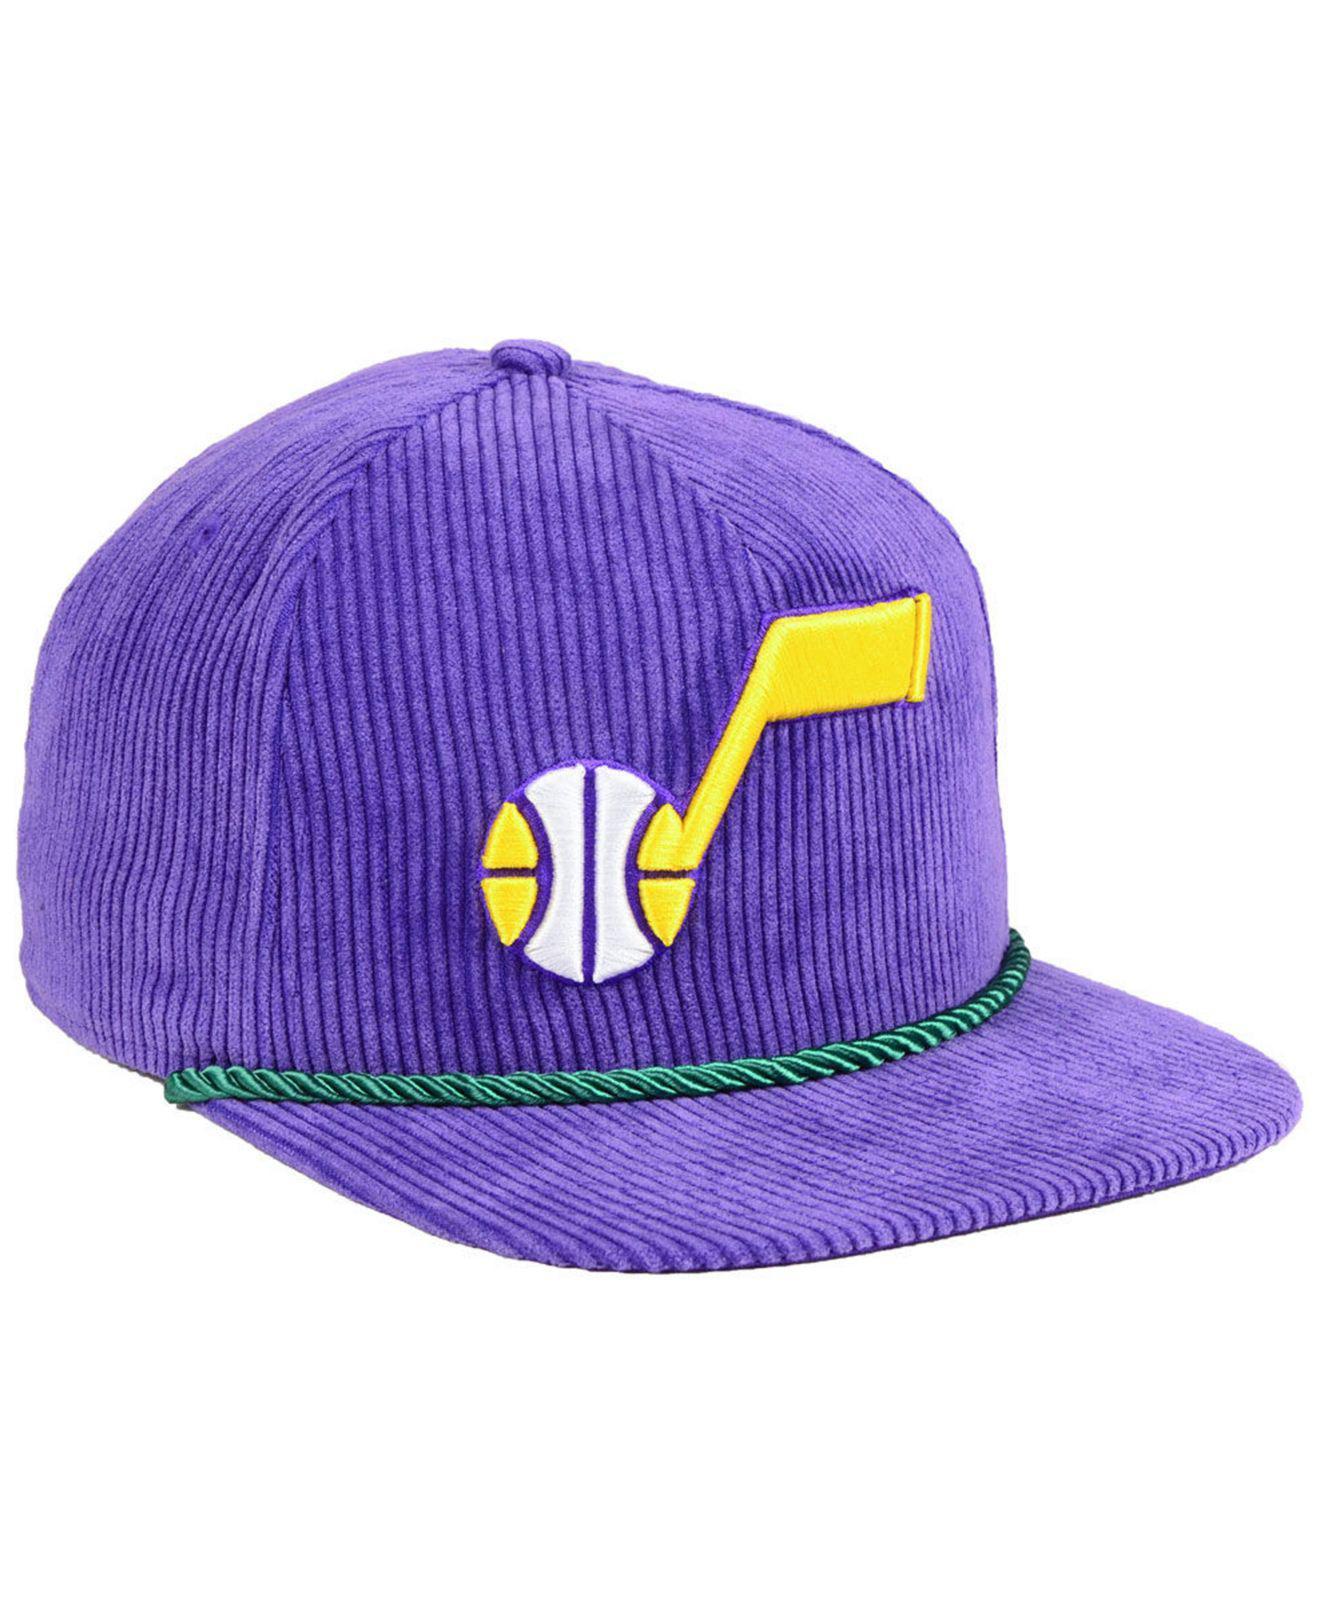 KTZ - Purple Utah Jazz Hardwood Classic Nights Cords 9fifty Snapback Cap  for Men - Lyst. View fullscreen c86213cbc